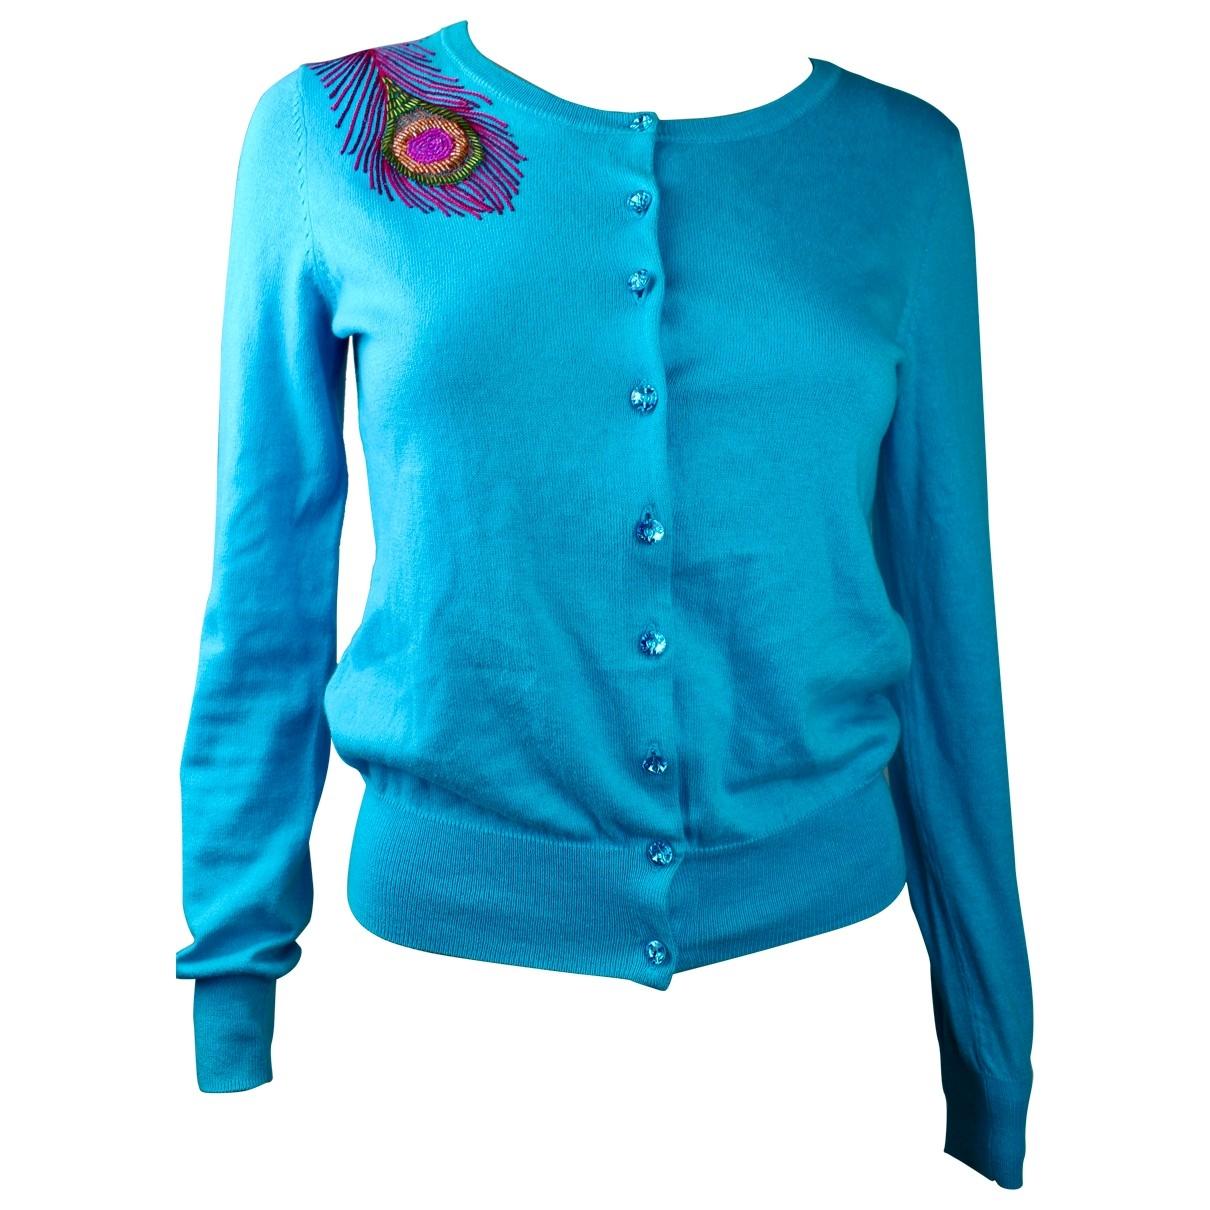 Matthew Williamson For H&m \N Blue Cotton Knitwear for Women XS International